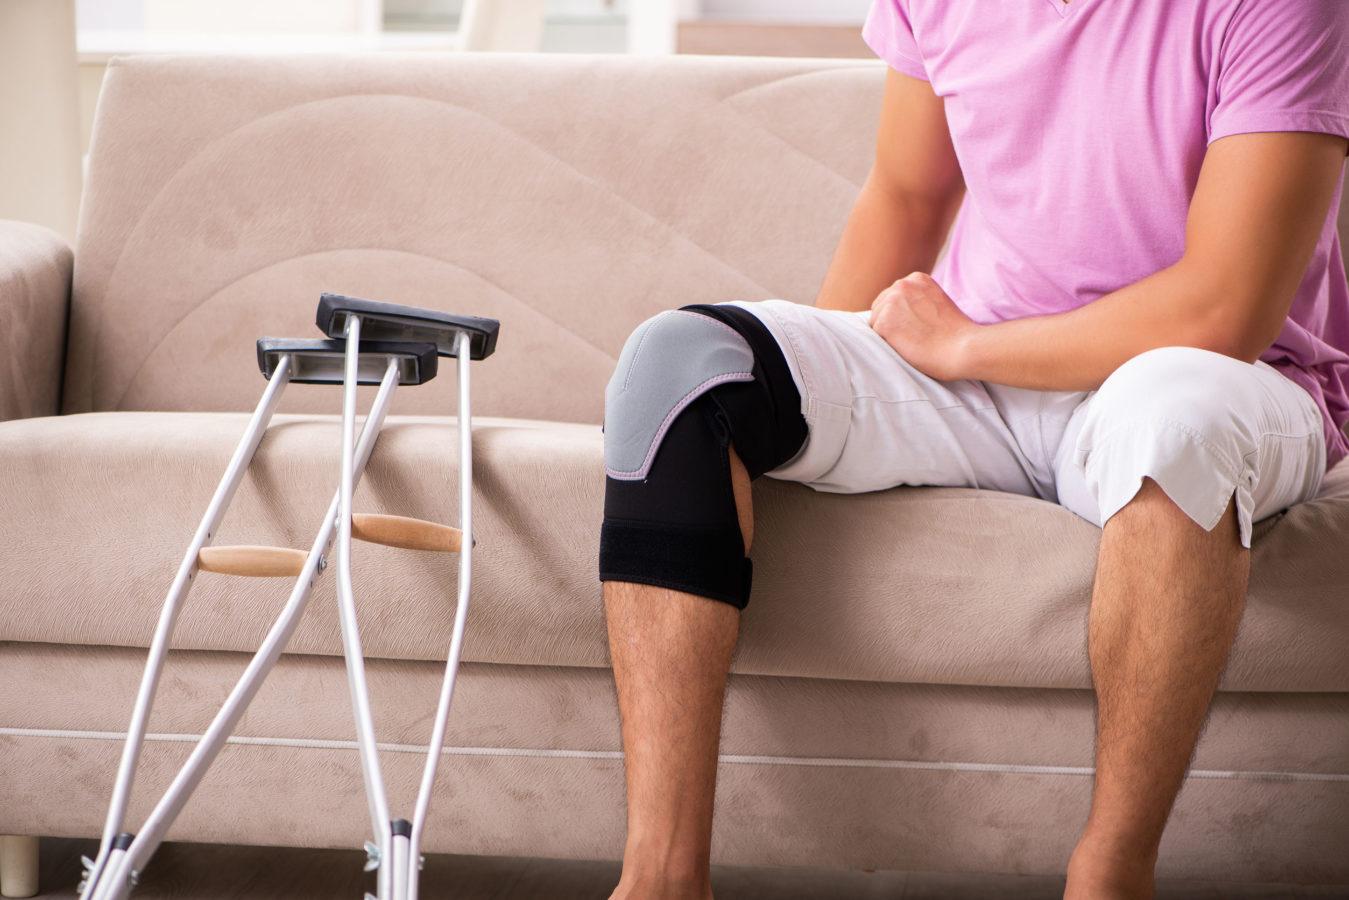 Hurt knee and crutches